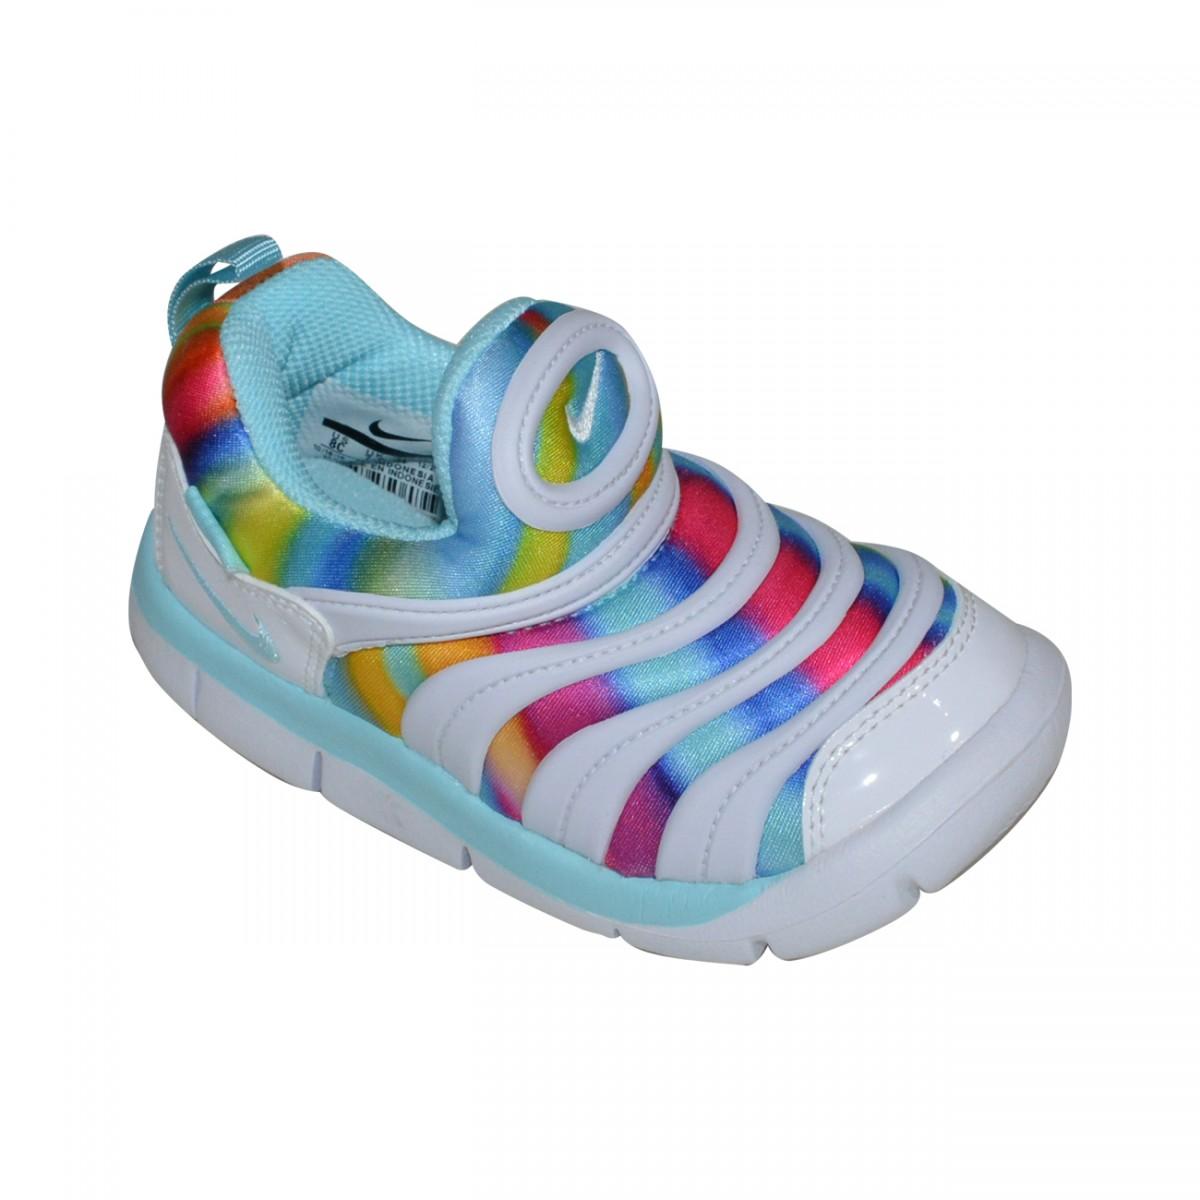 size 40 6ea59 280da Tenis Nike Dynamo Free Print TD Infantil 834366 100 - BrancoMulticolor -  Chuteira Nike, Adidas. Sandalias Femininas. Sandy Calçados